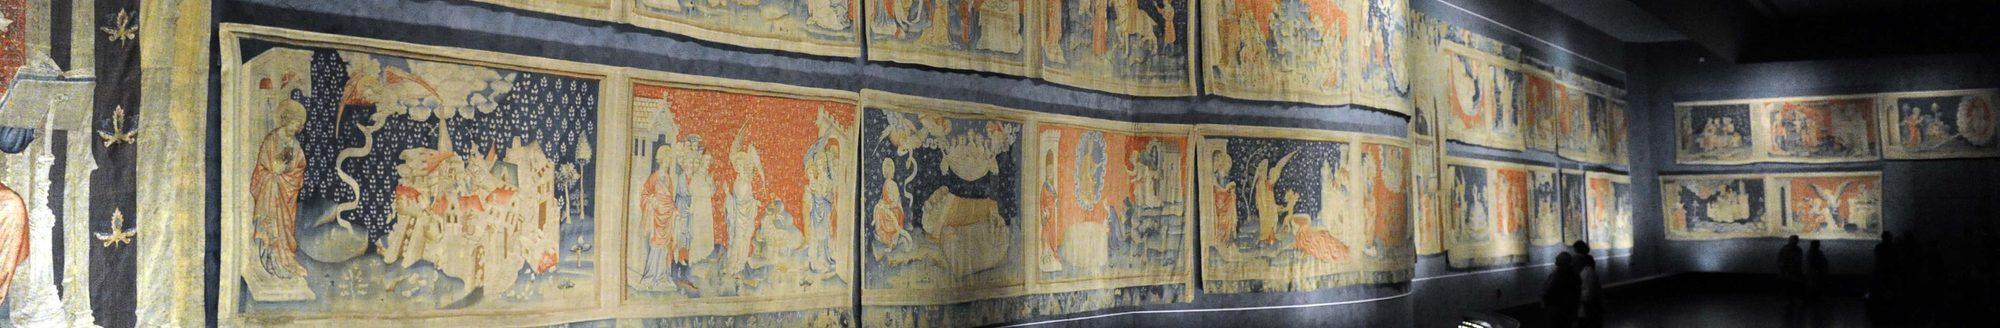 Castello d'Angers